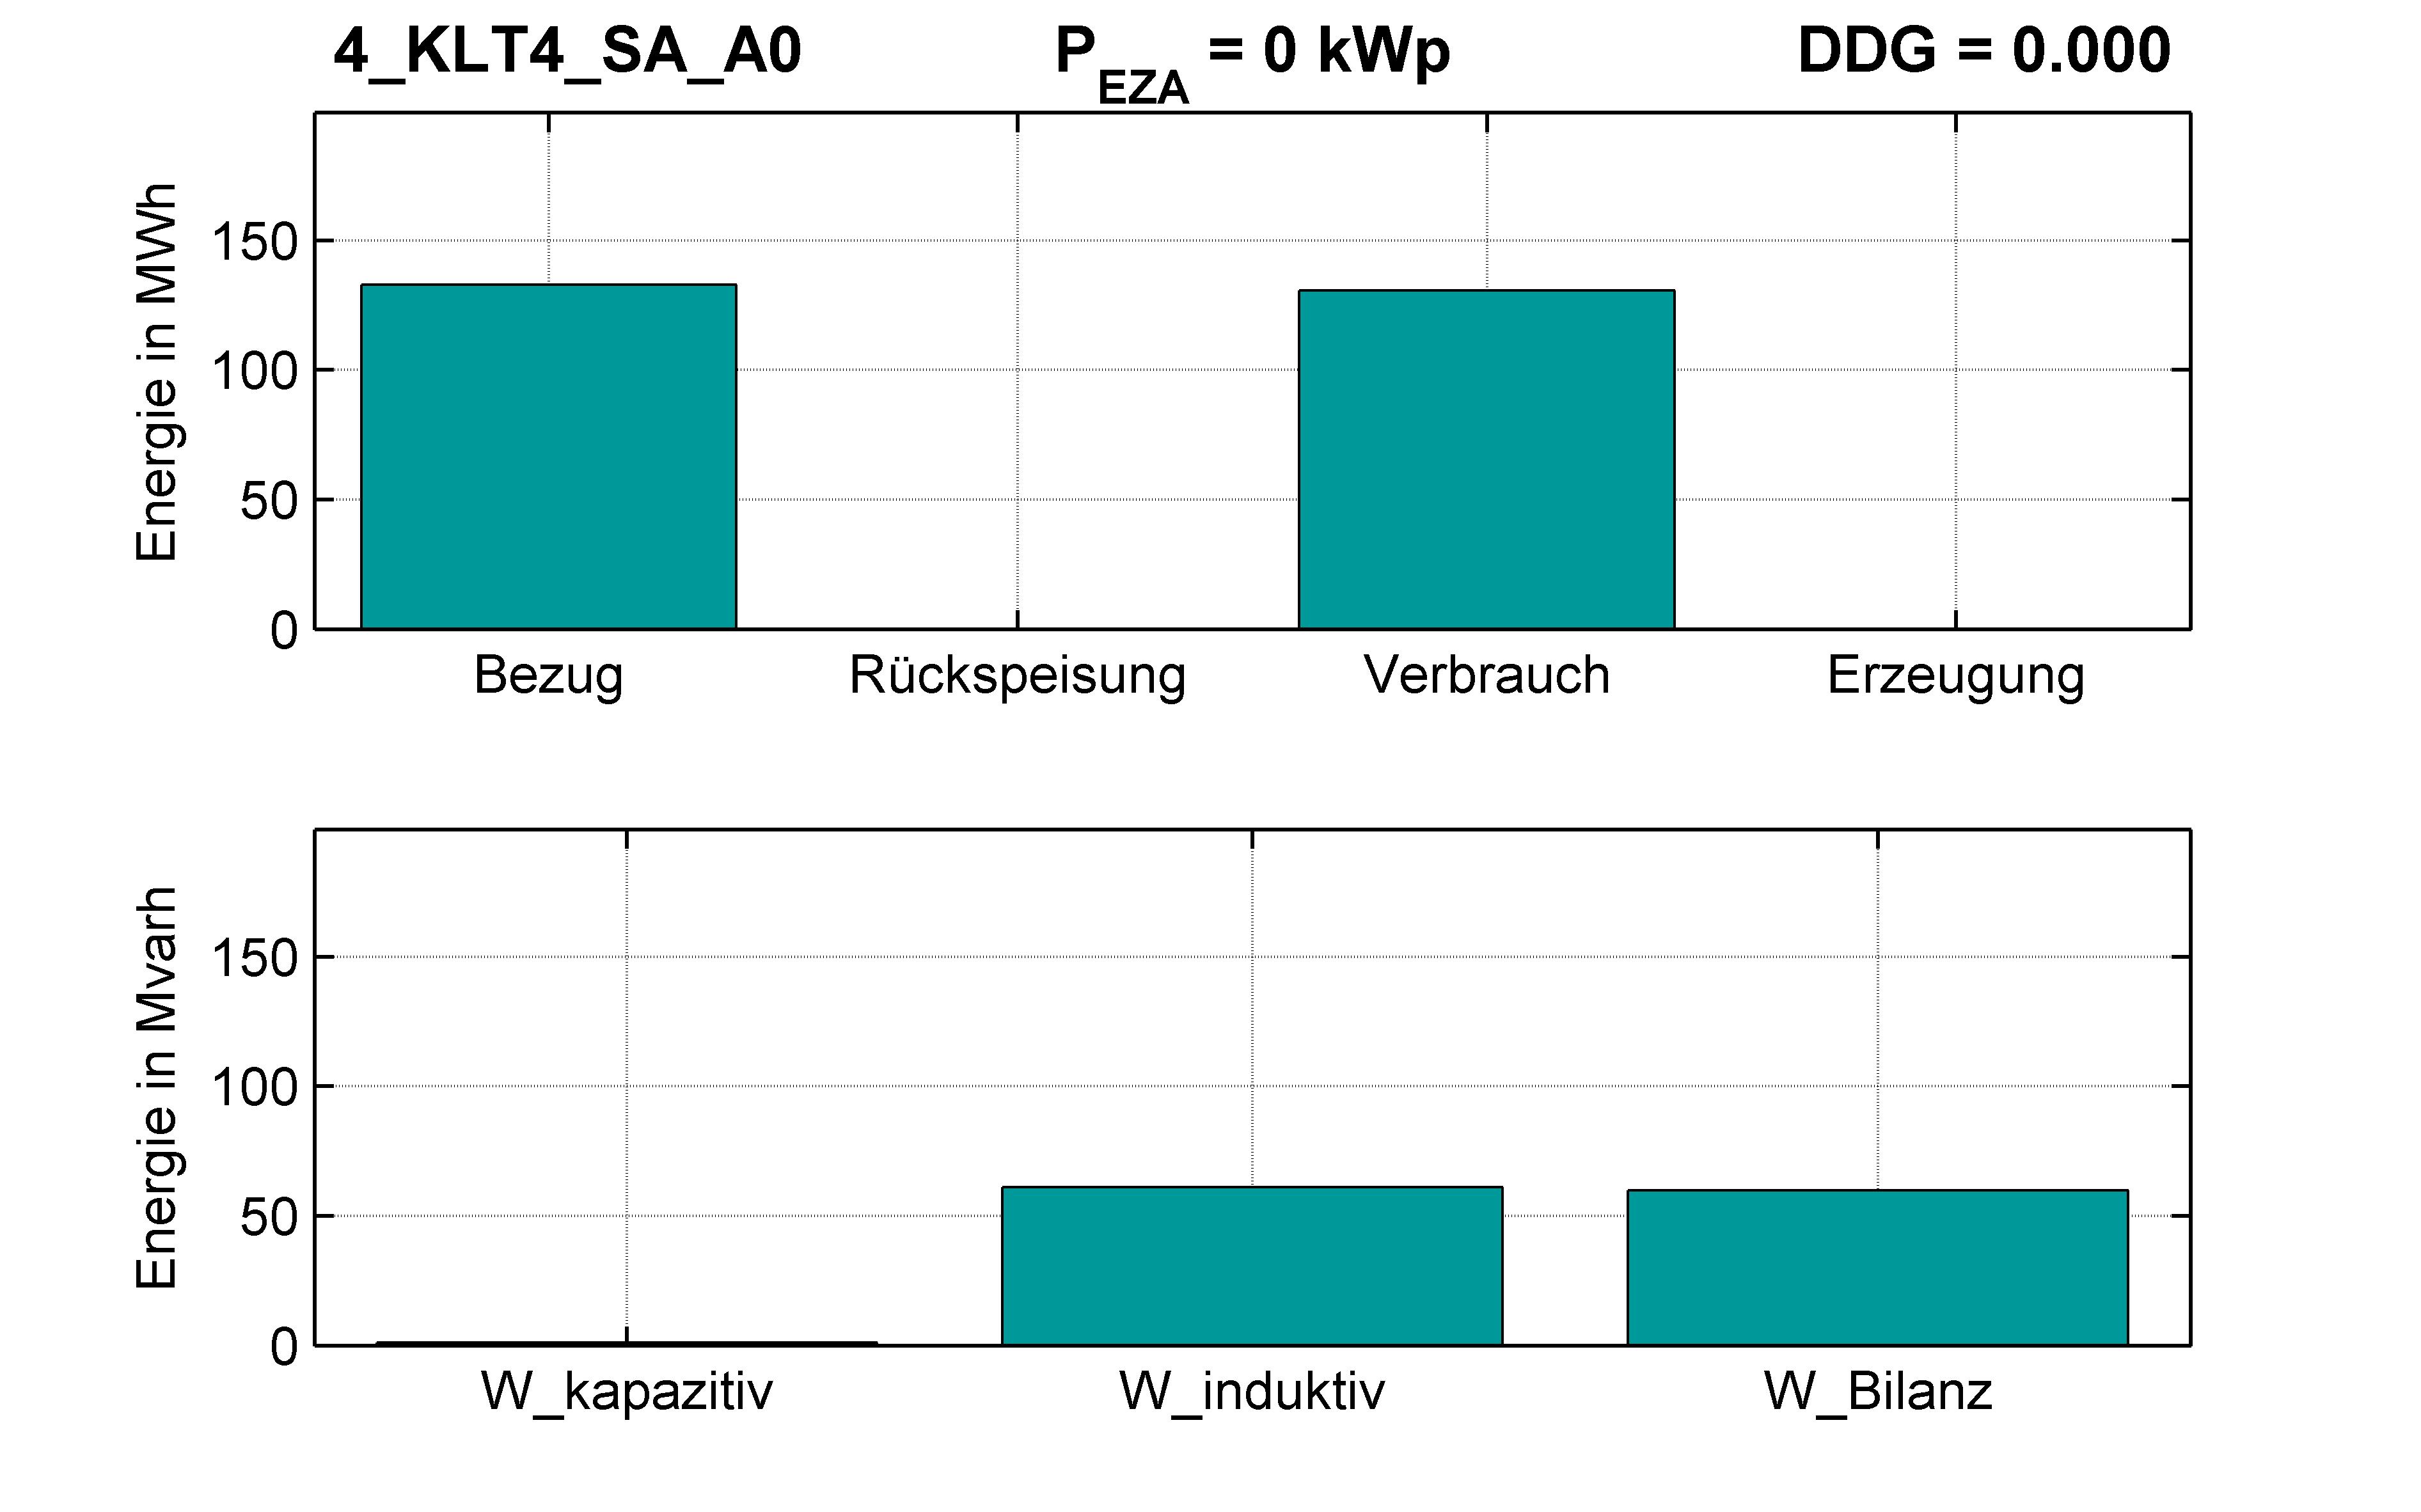 KLT4 | P-Kappung 55% (SA) A0 | PQ-Bilanz